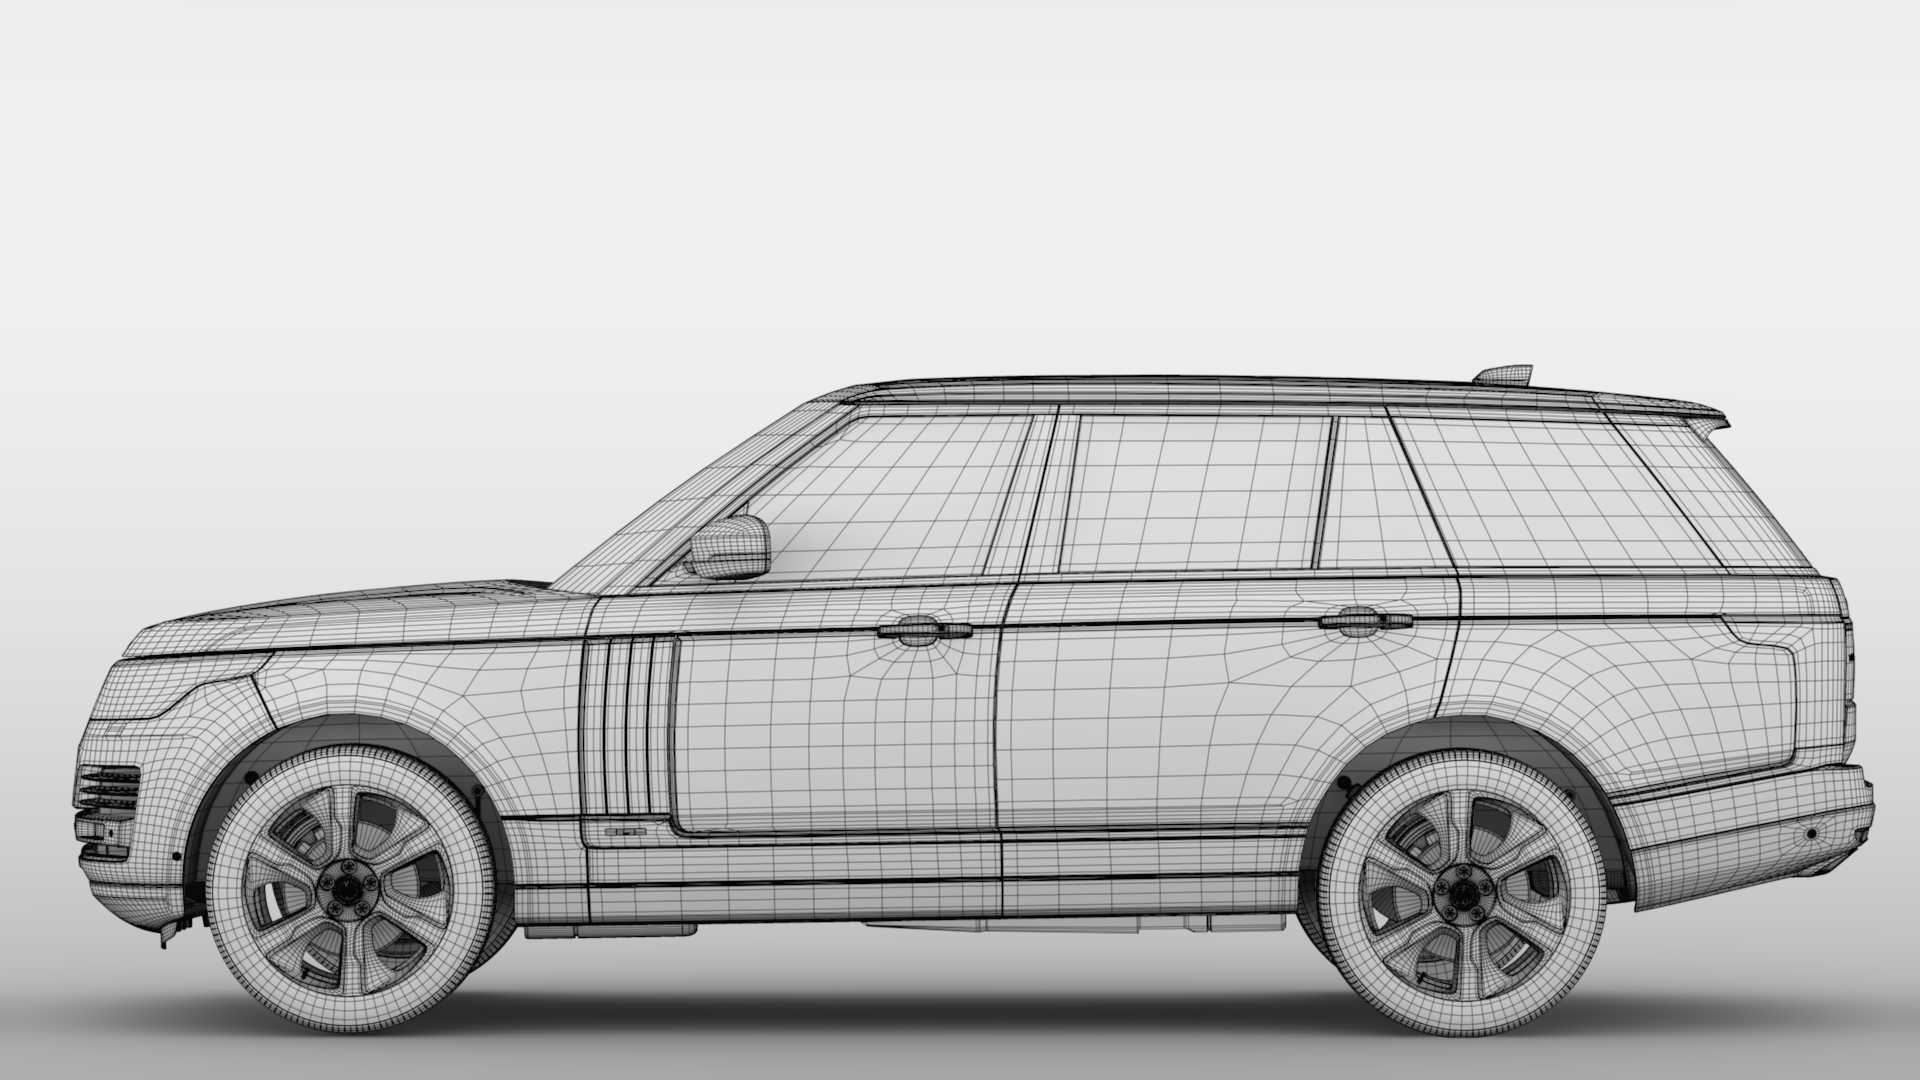 range rover vogue lwb l405 2018 3d model max fbx c4d lwo ma mb hrc xsi obj 277540